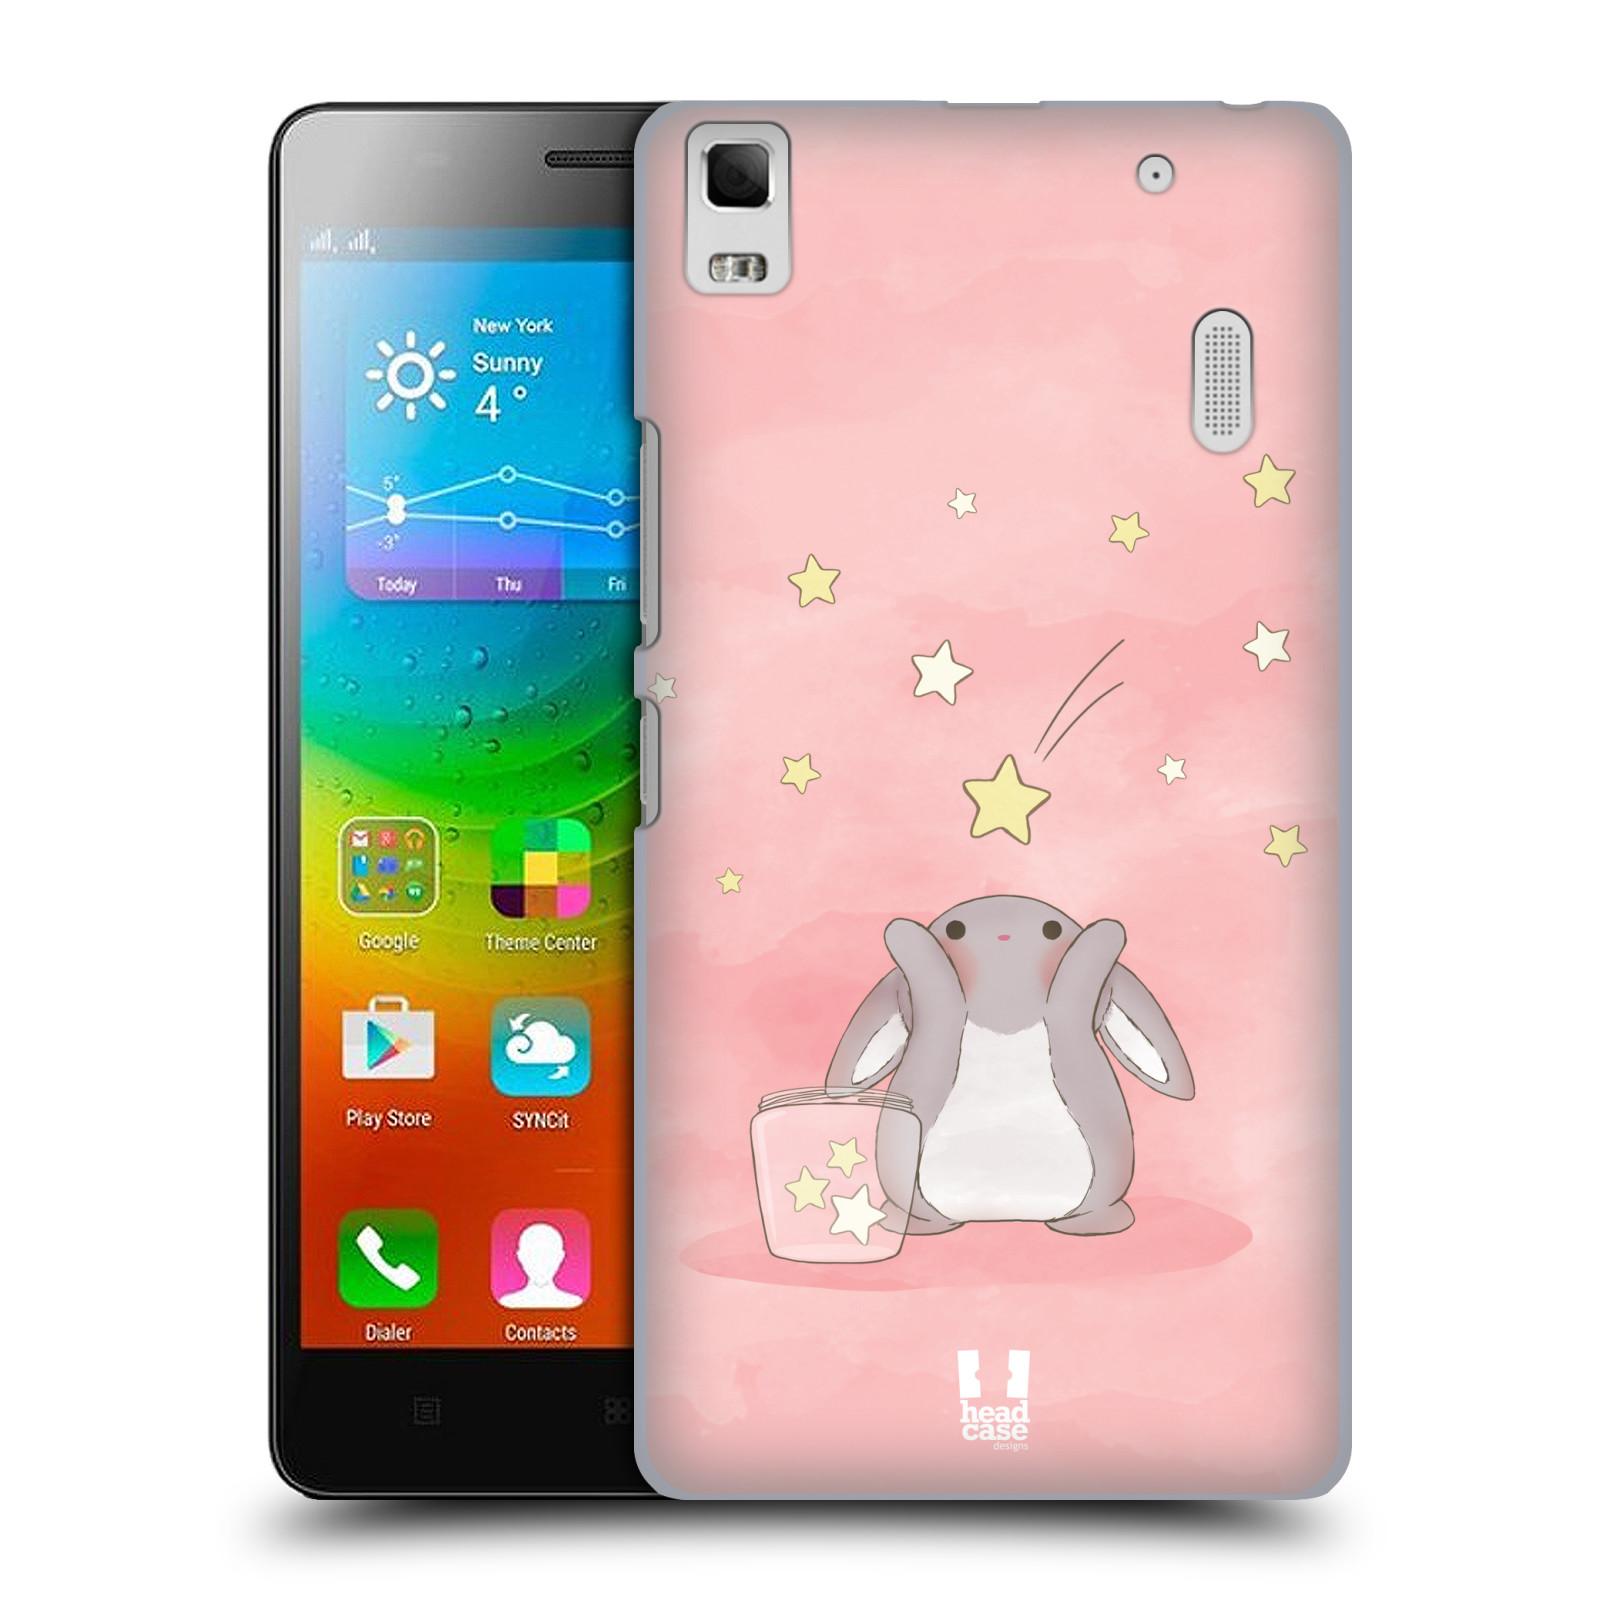 HEAD CASE pevný plastový obal na mobil LENOVO A7000 / A7000 DUAL / K3 NOTE vzor králíček a hvězdy růžová